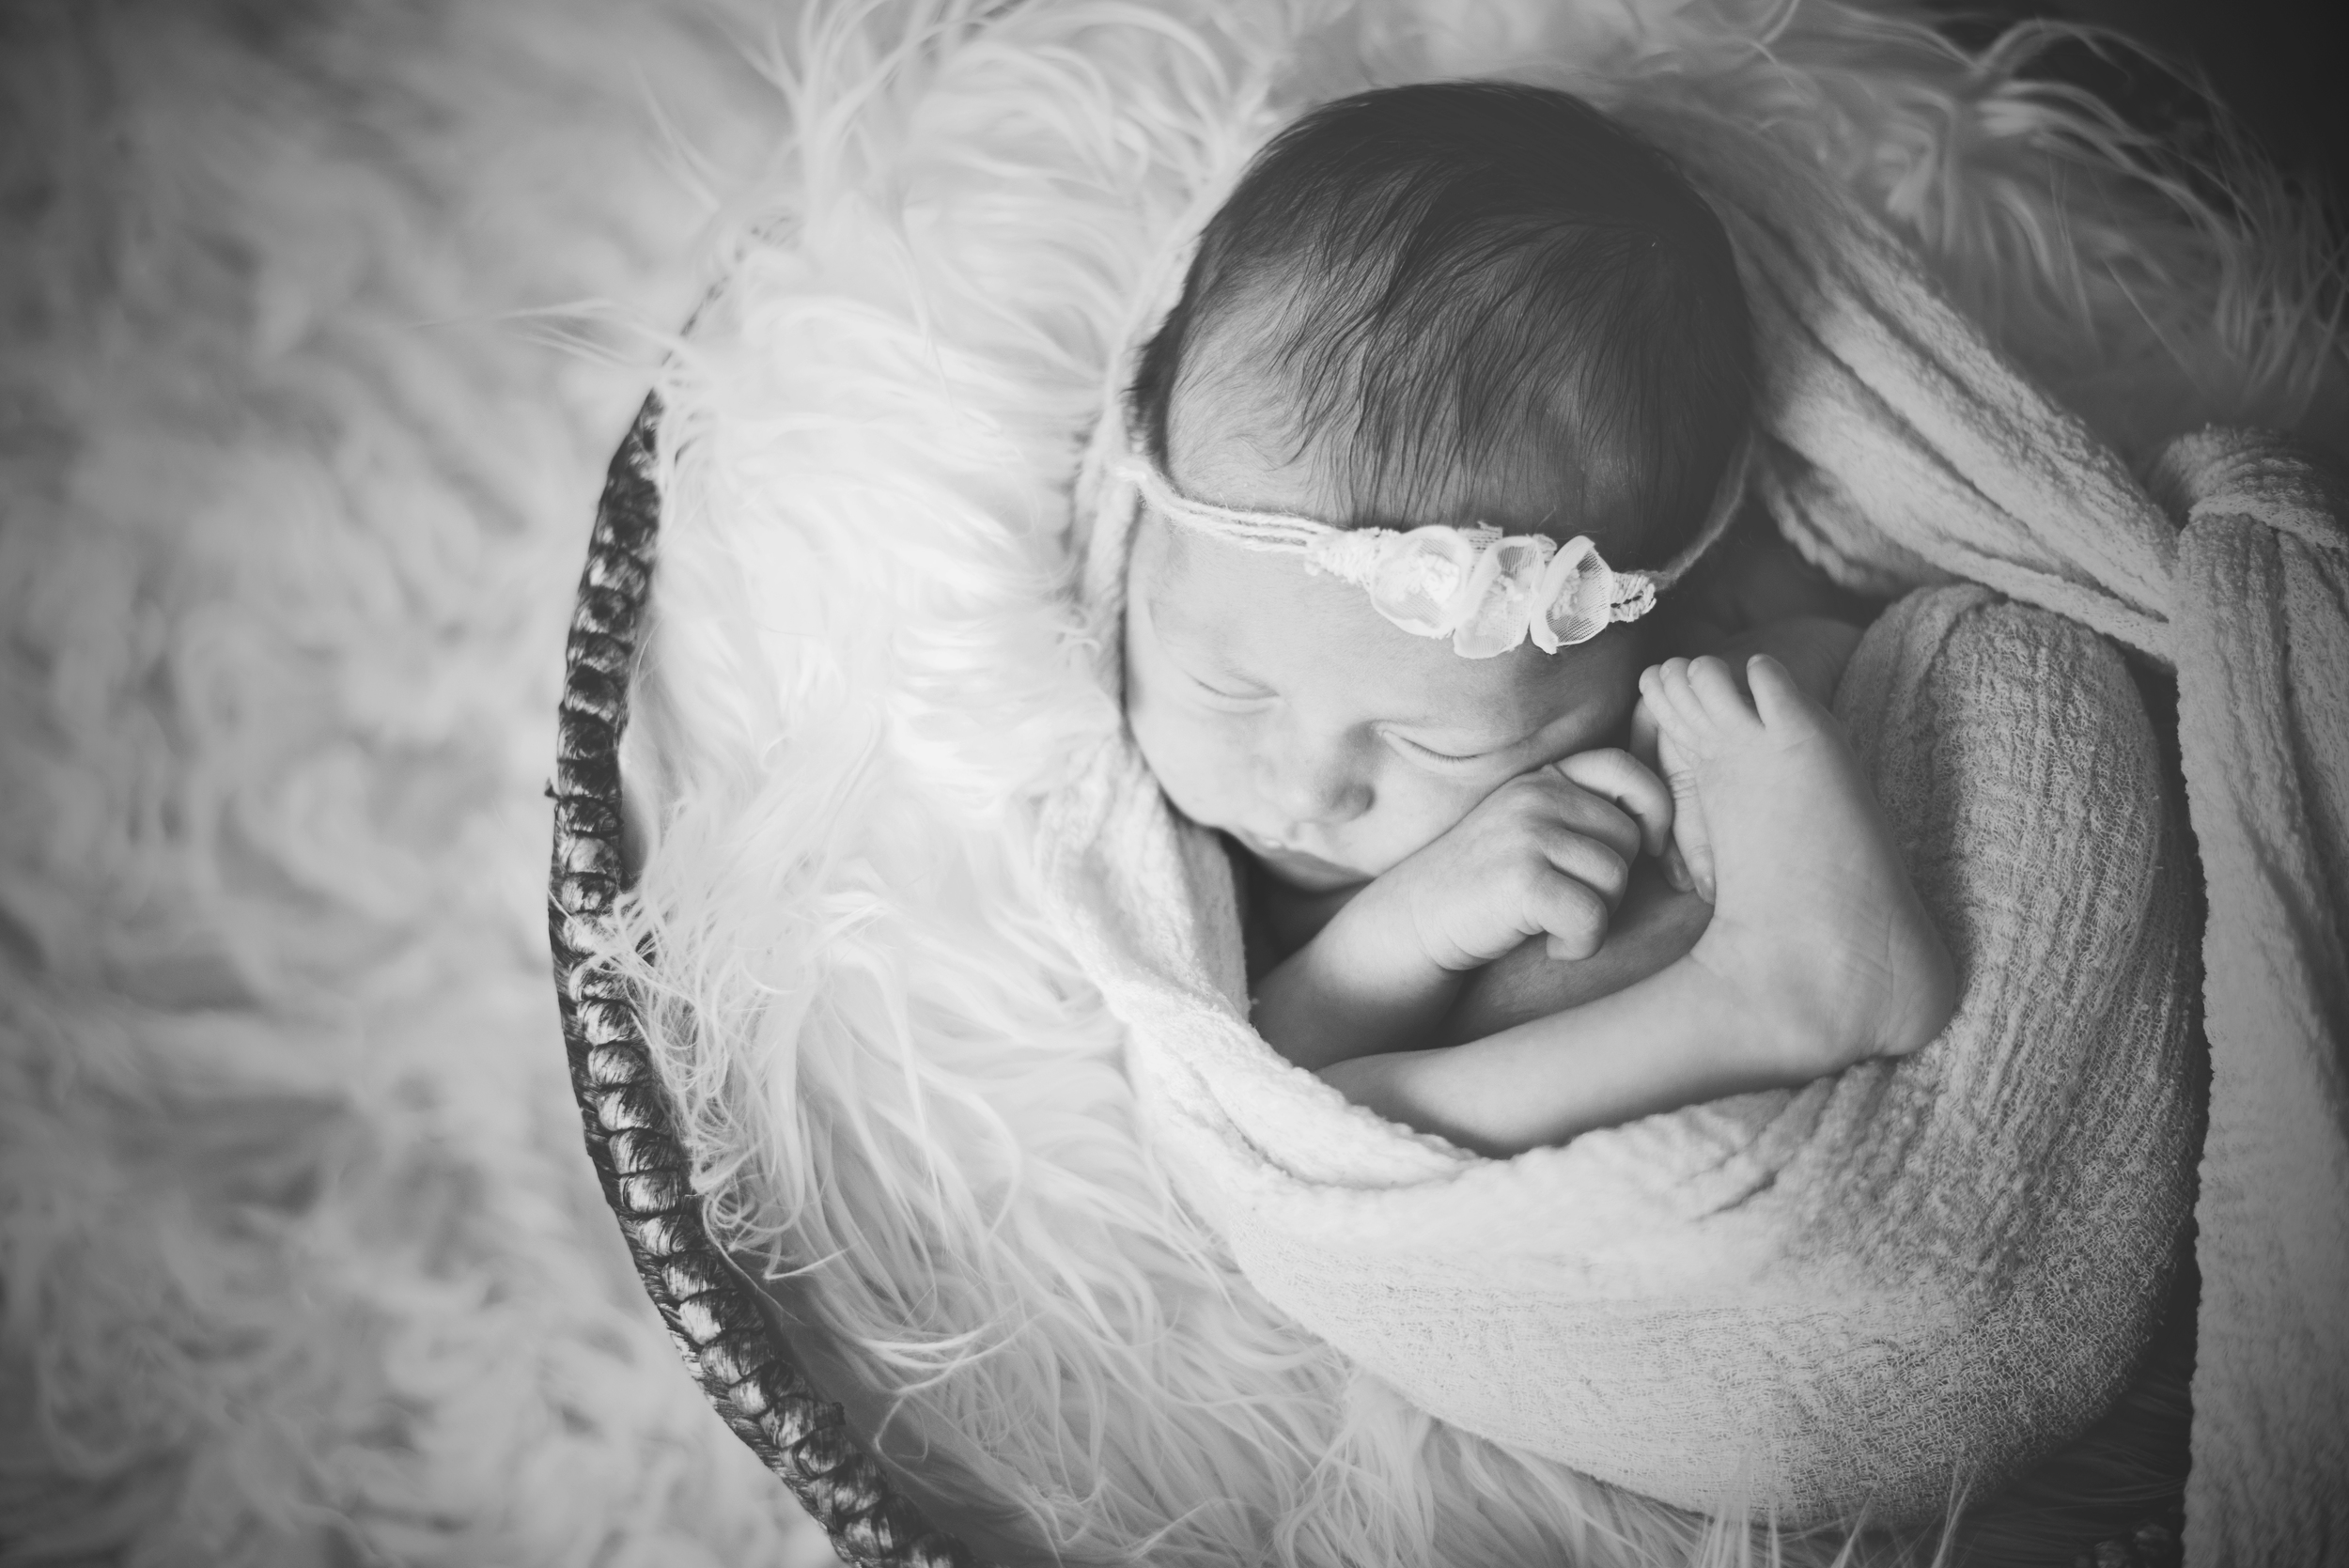 Melissa_Zimmer_Newborn_Photographer_5.jpg